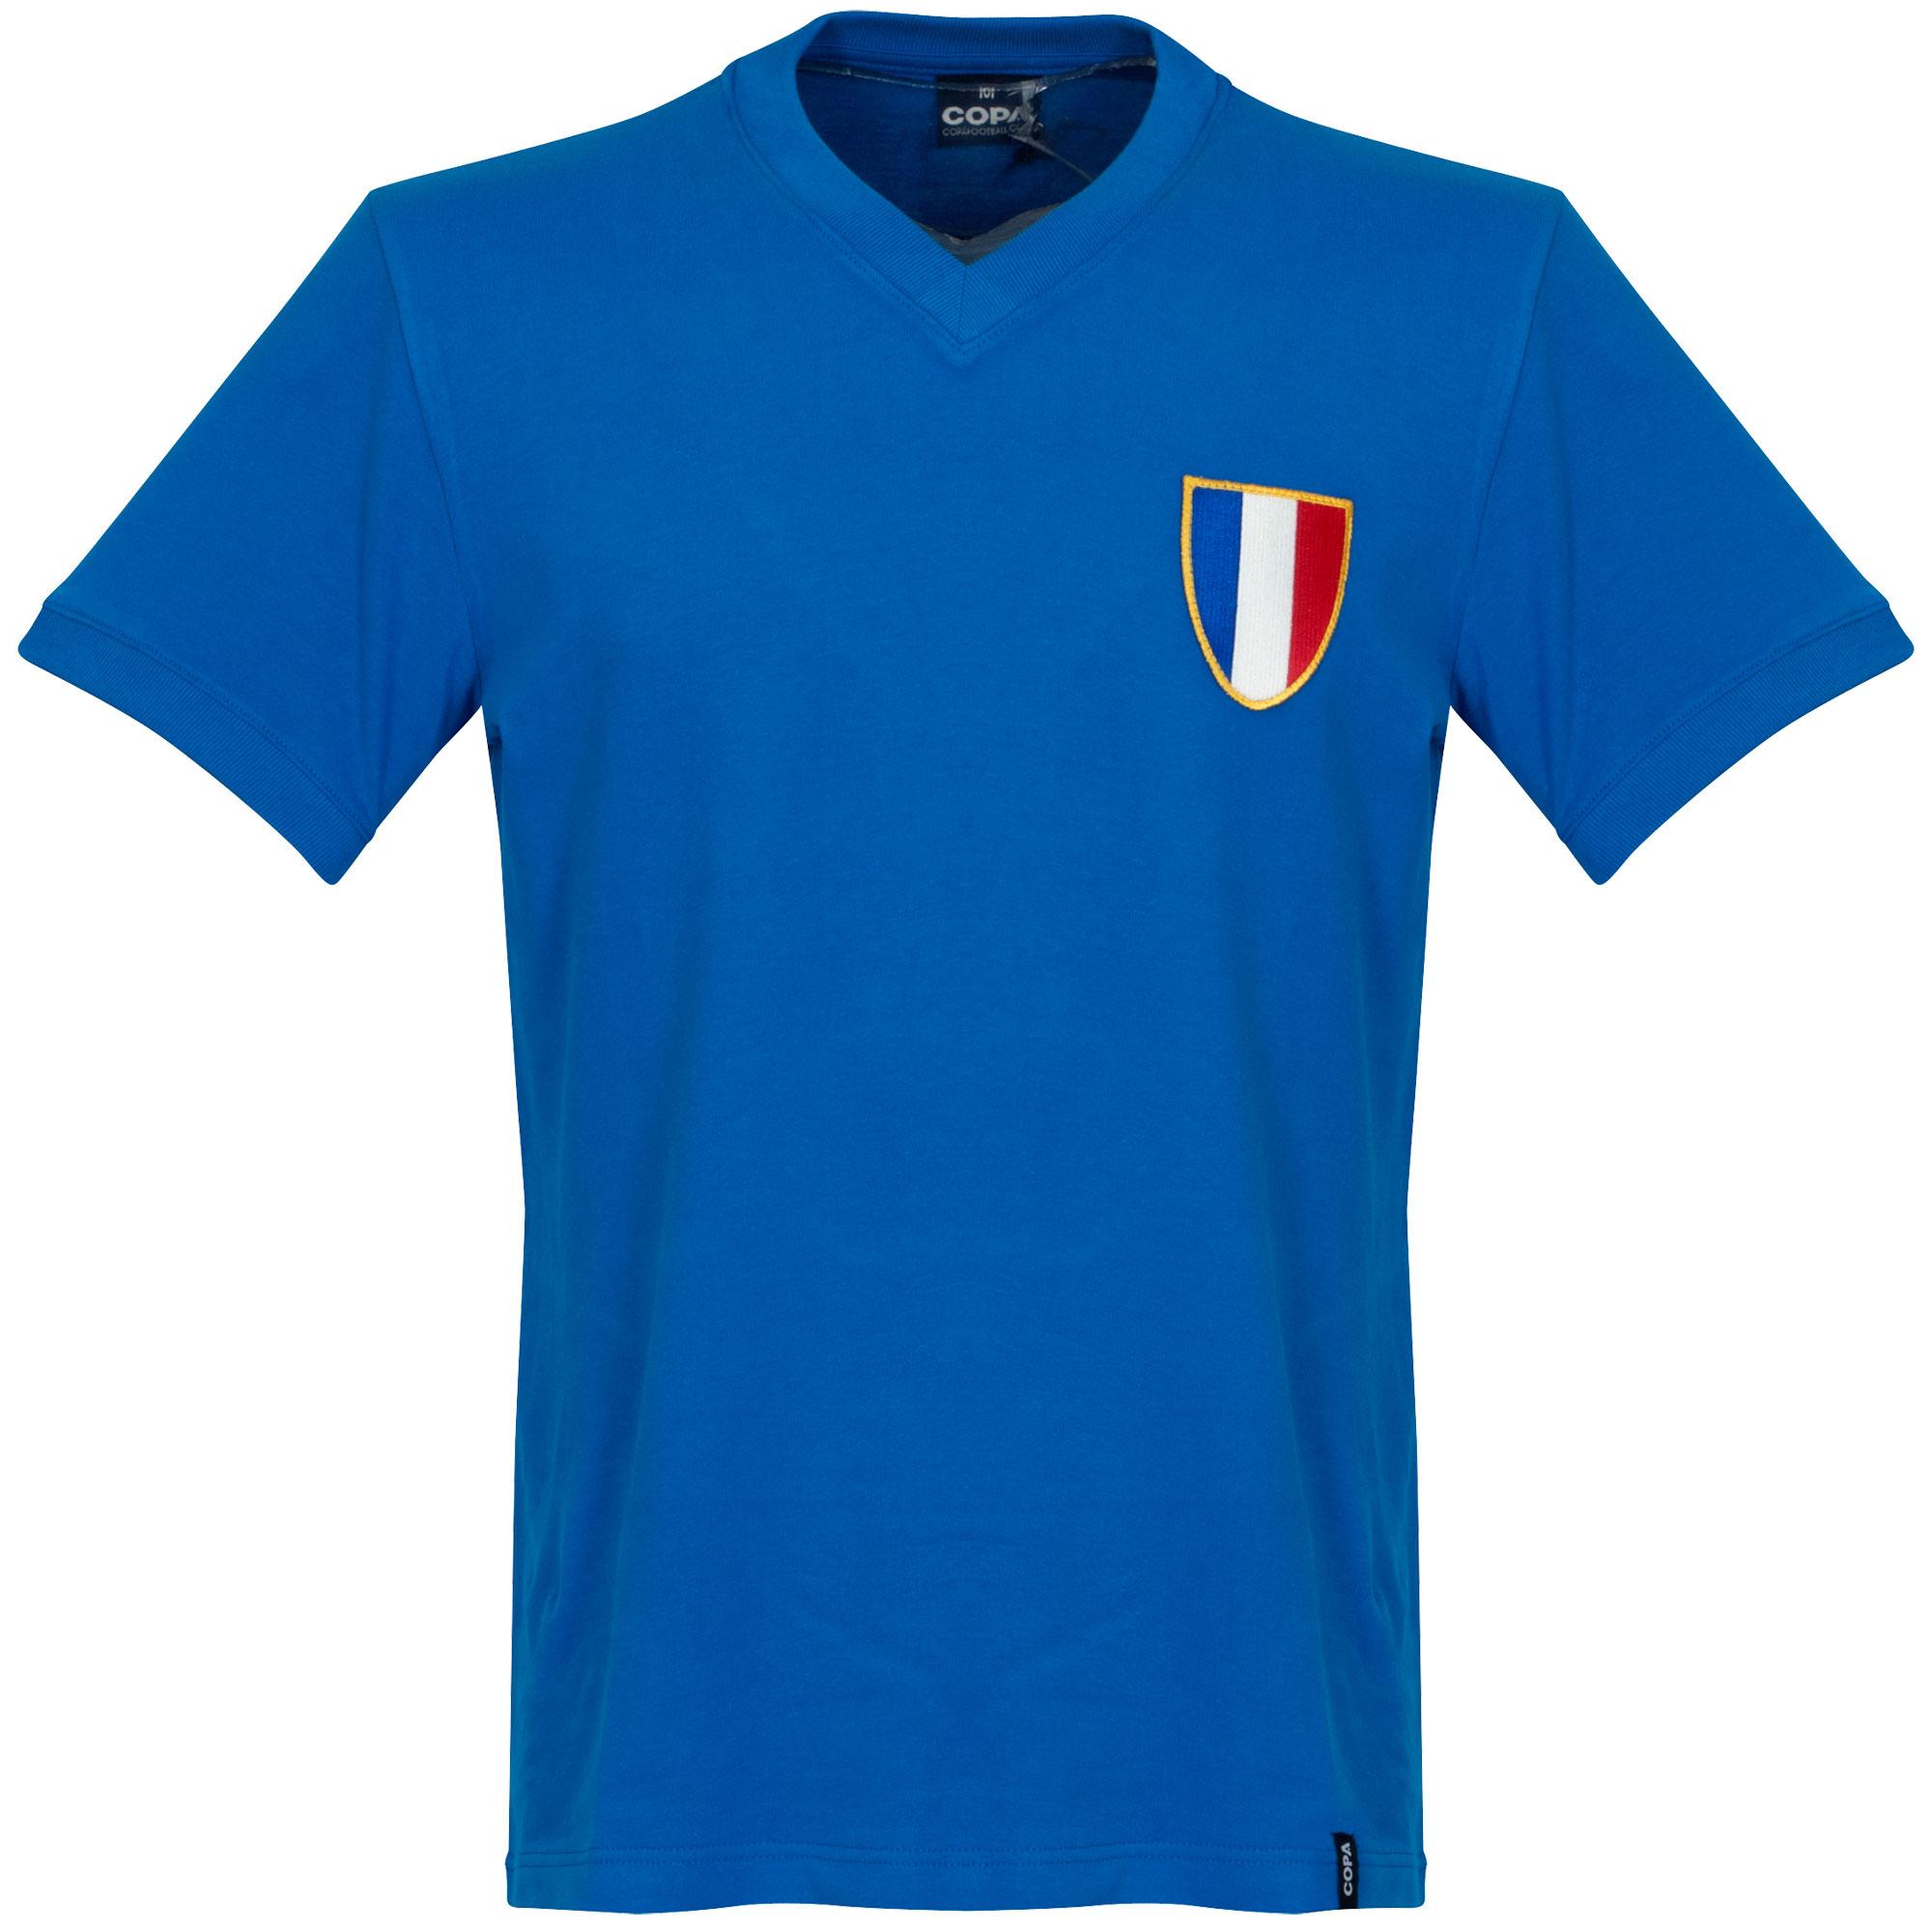 1968 France Olympics Retro Shirt - XXL